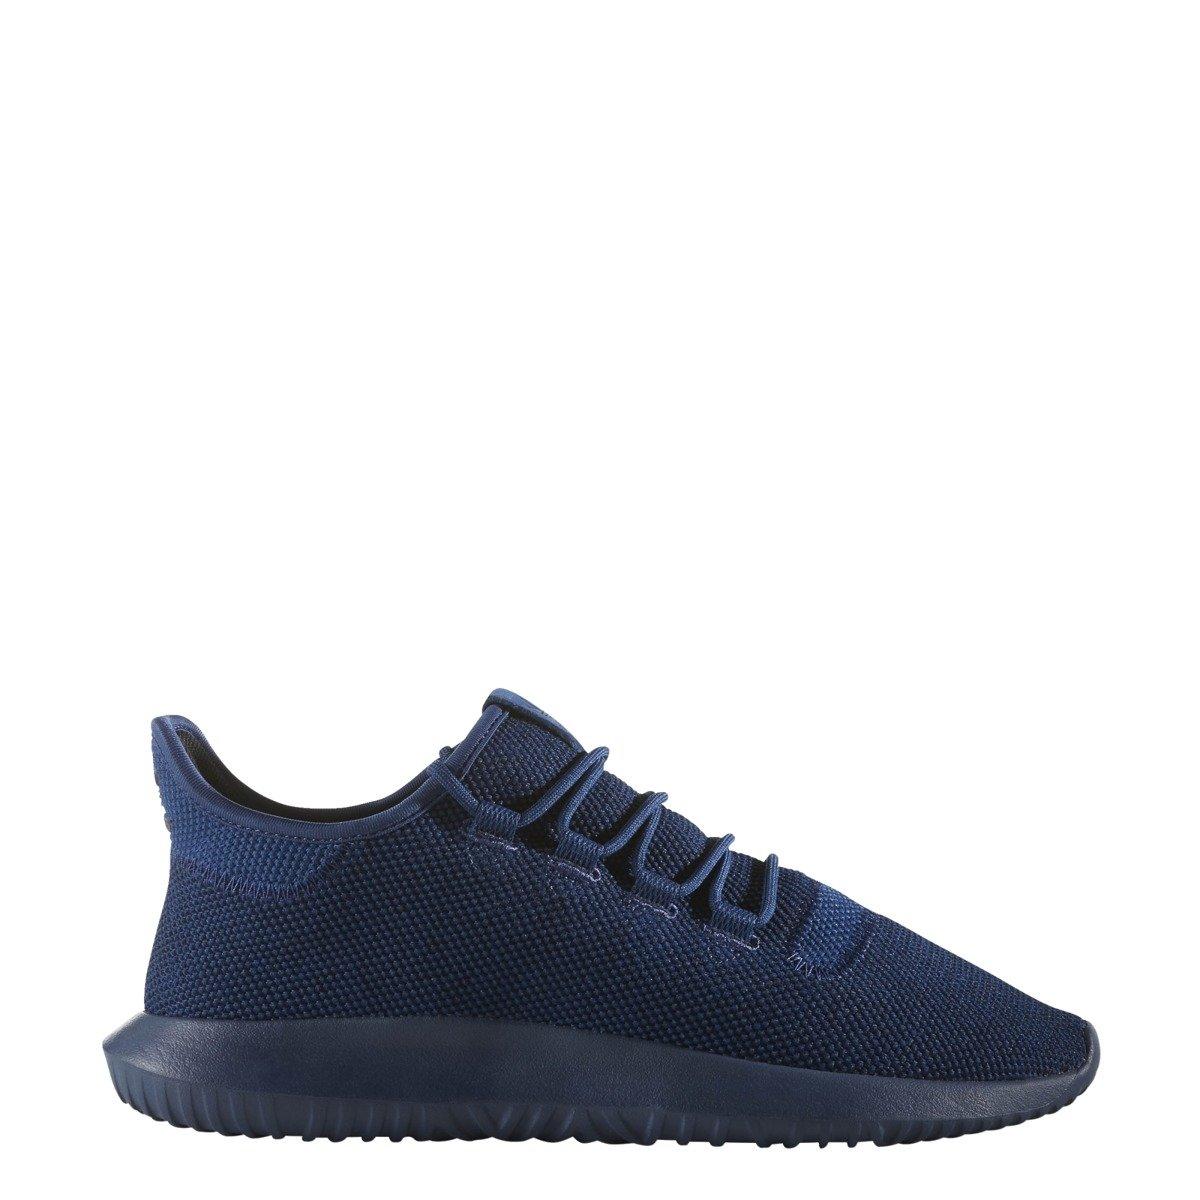 low priced 17d19 d9b46 Adidas Tubular Shadow Shoes -BB8825